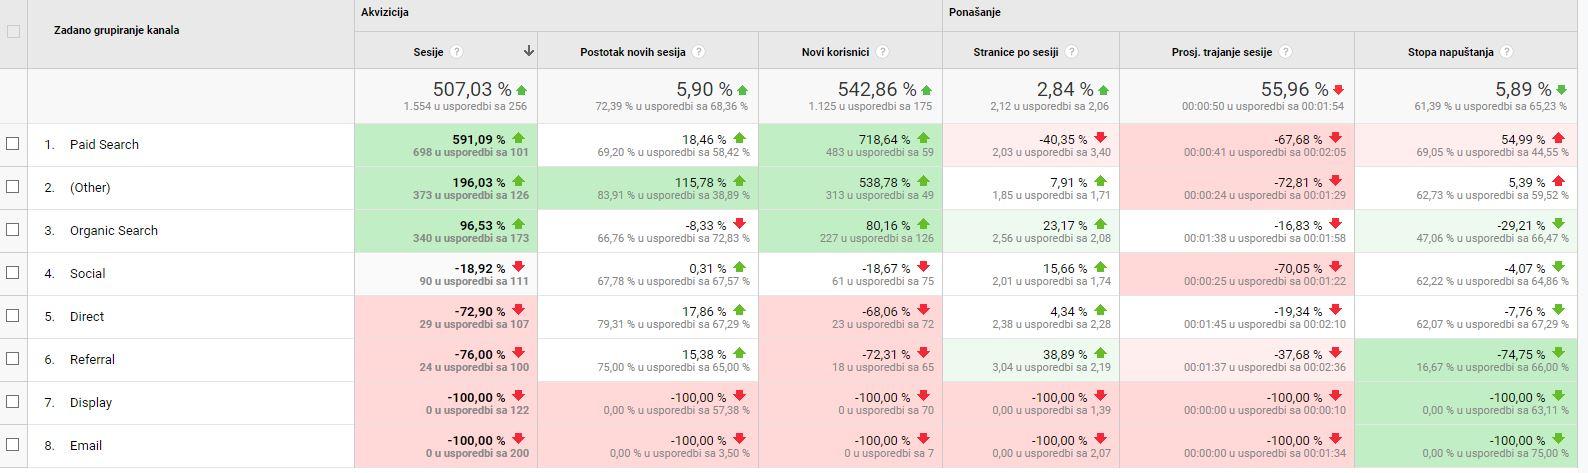 Google Analytics Benchmark Report 2